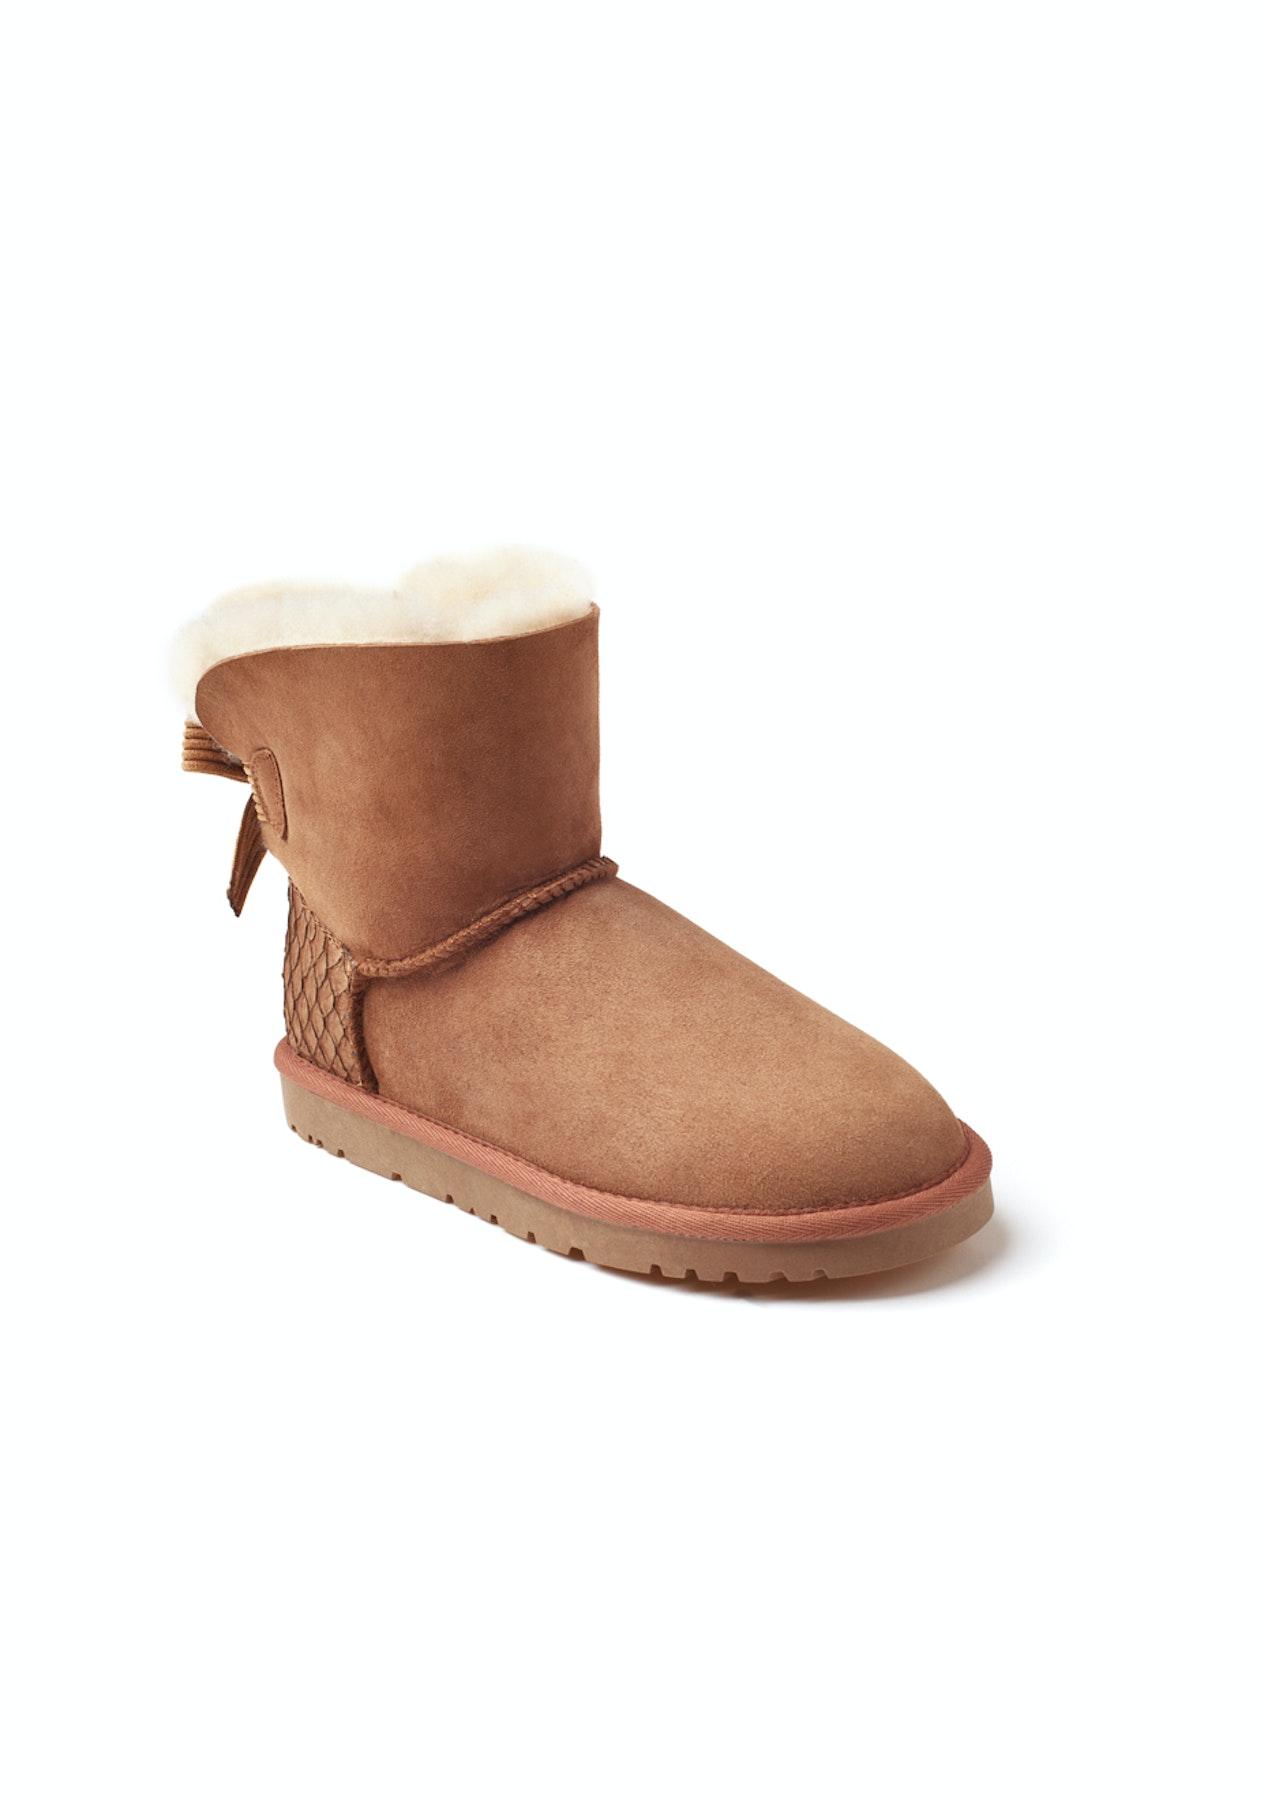 cd80926b85bee Ozwear - Ugg Ugg One Bailey Bow Corduroy Boots (Scale-Embossed Heel Pop)  (Water Resistant) - Chestnut - Half Price Ozwear Uggs - Onceit